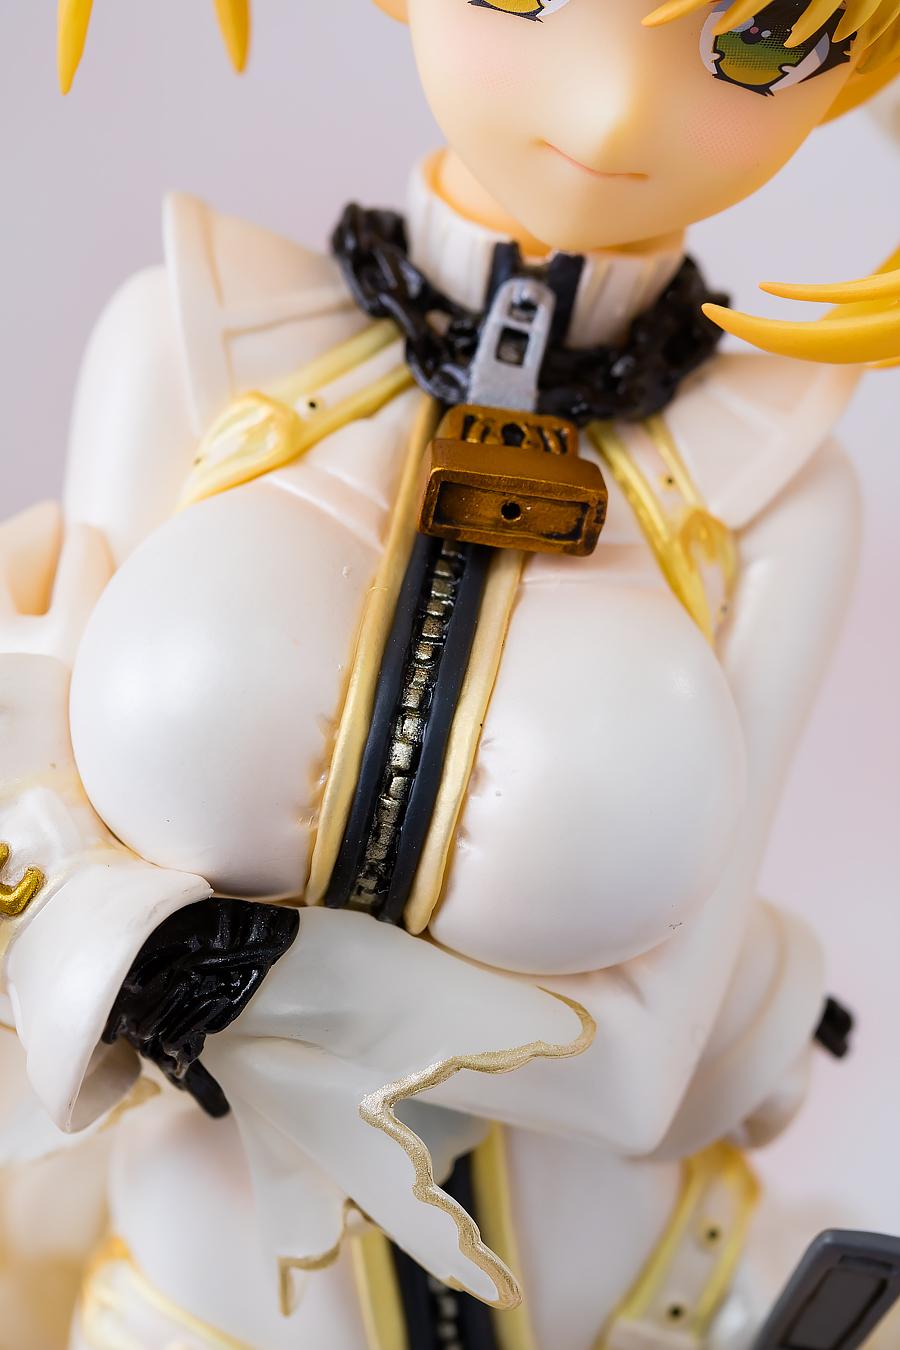 saibu 2 1 - ホビーマックス「Fate/EXTRA CCC セイバー・ブライド」フィギュアレビュー